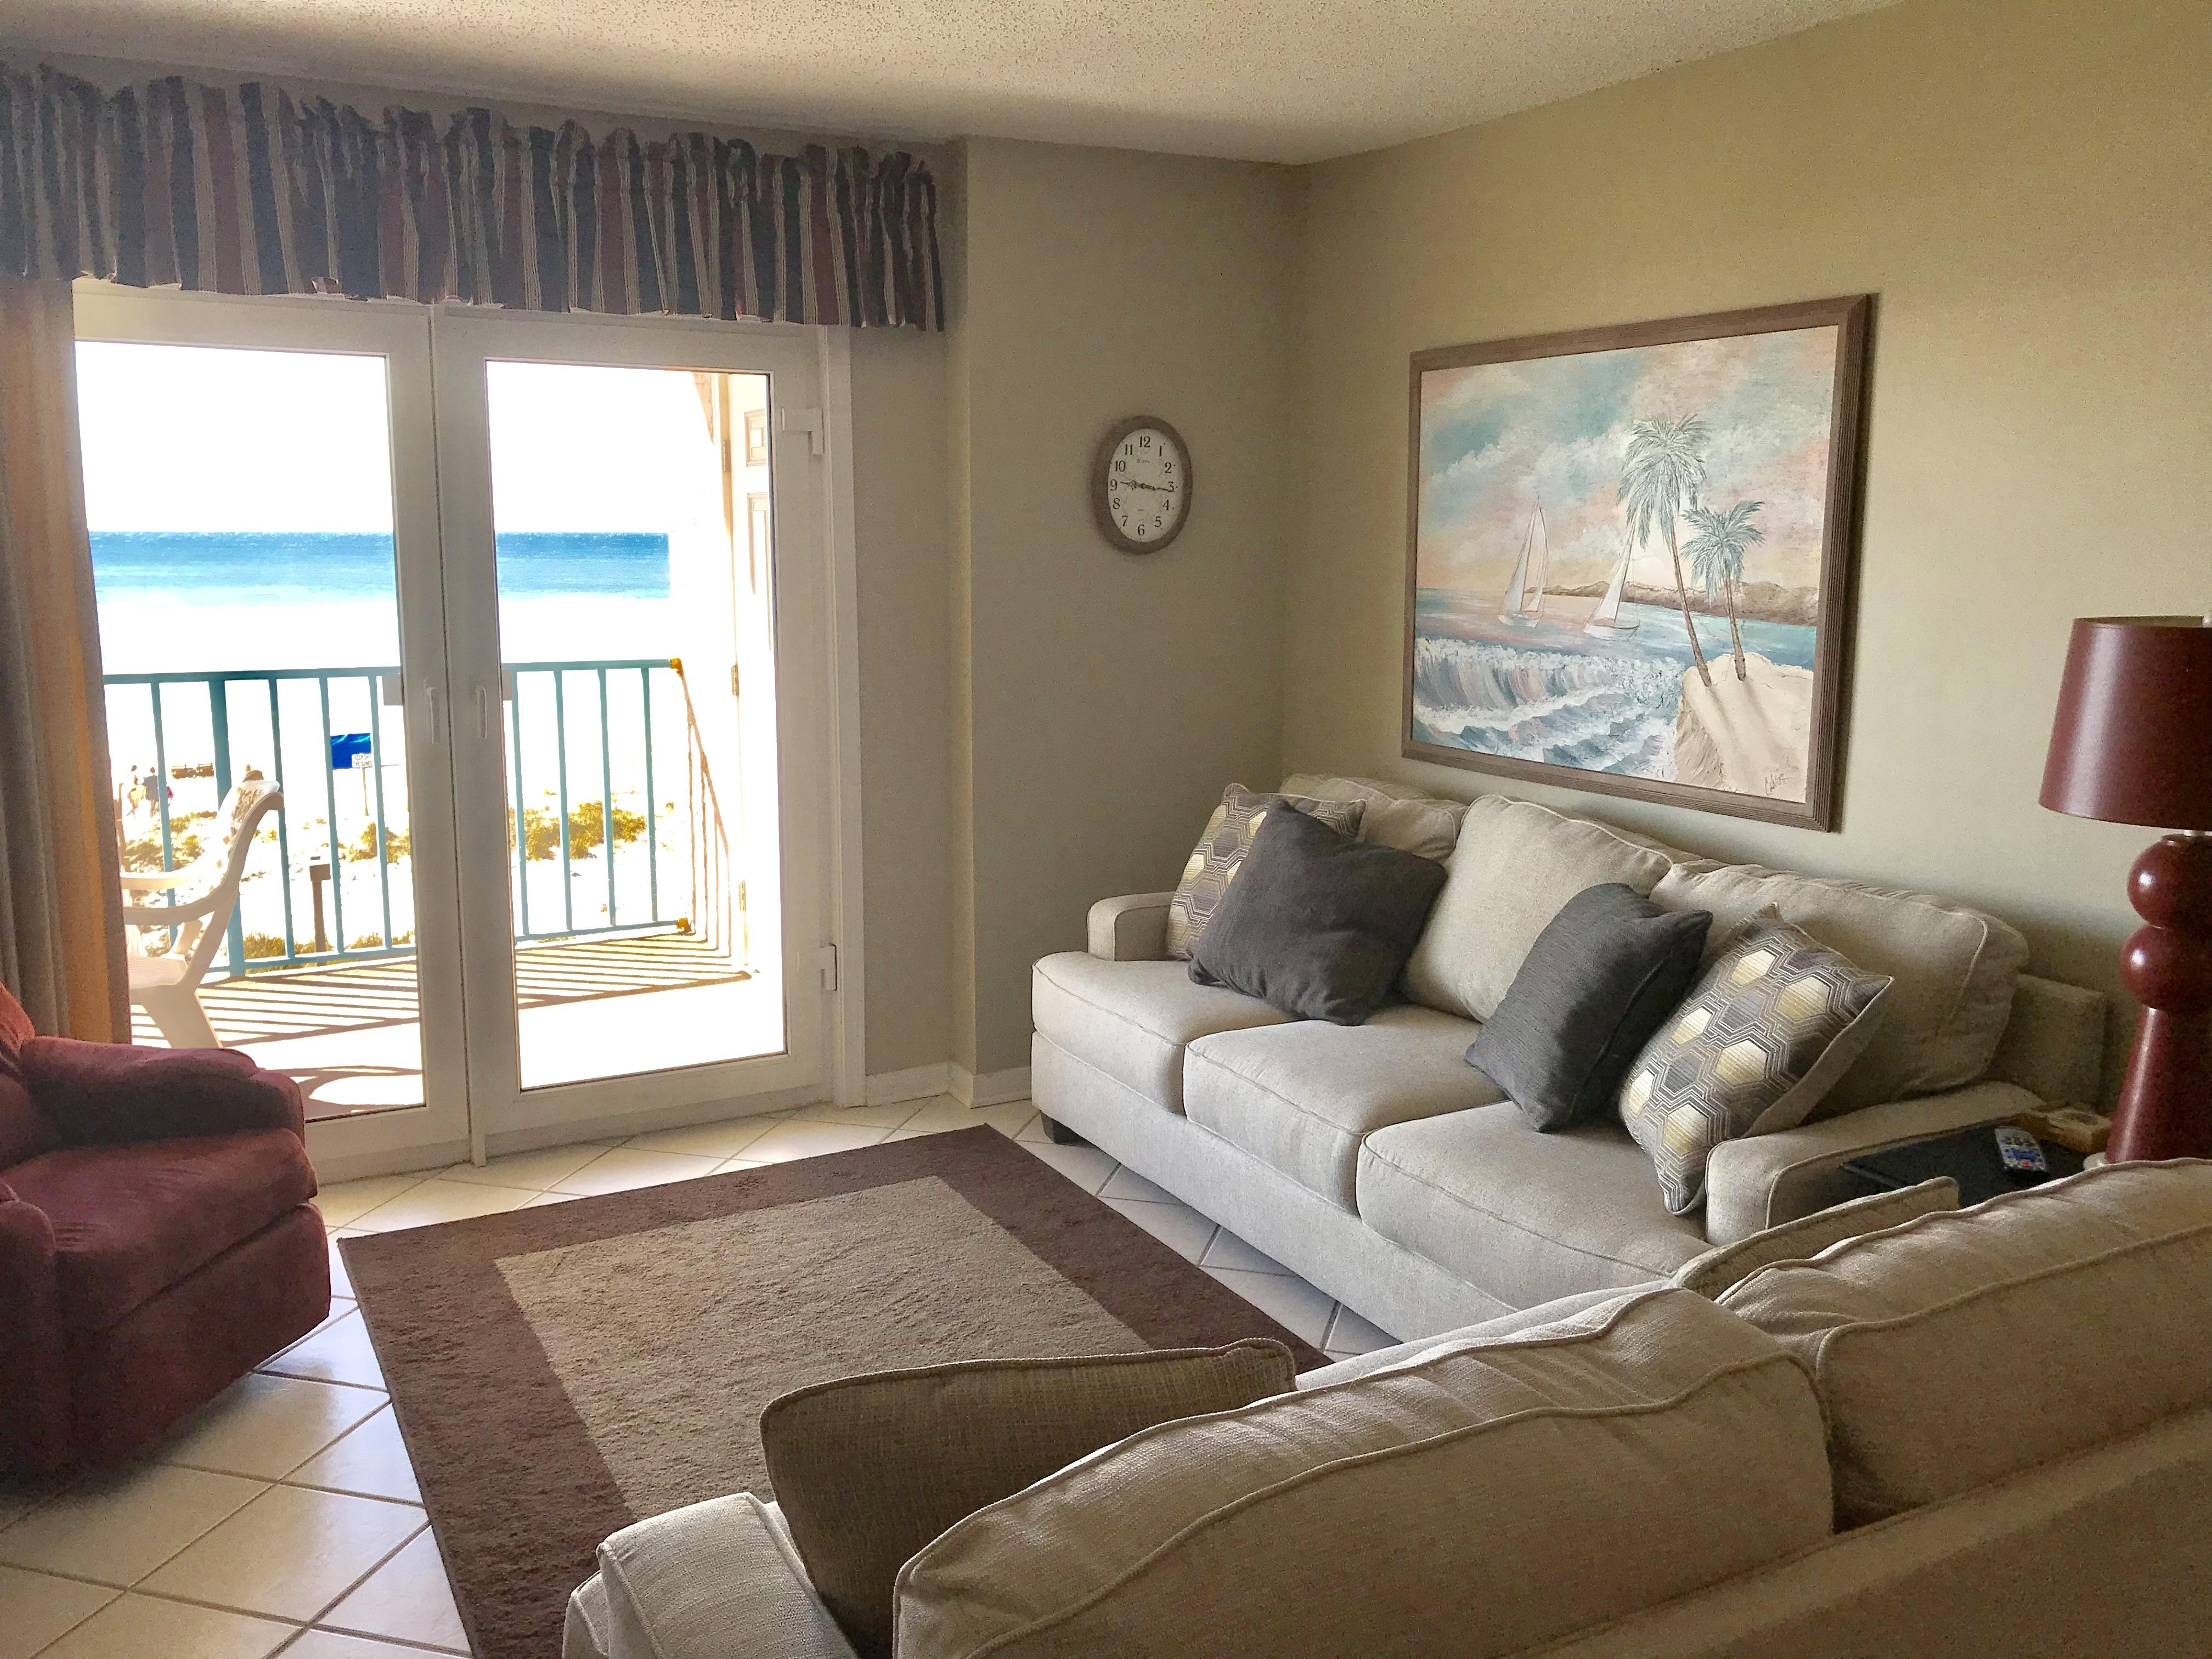 Surf Side Shores 2303 Condo rental in Surfside Shores - Gulf Shores in Gulf Shores Alabama - #2